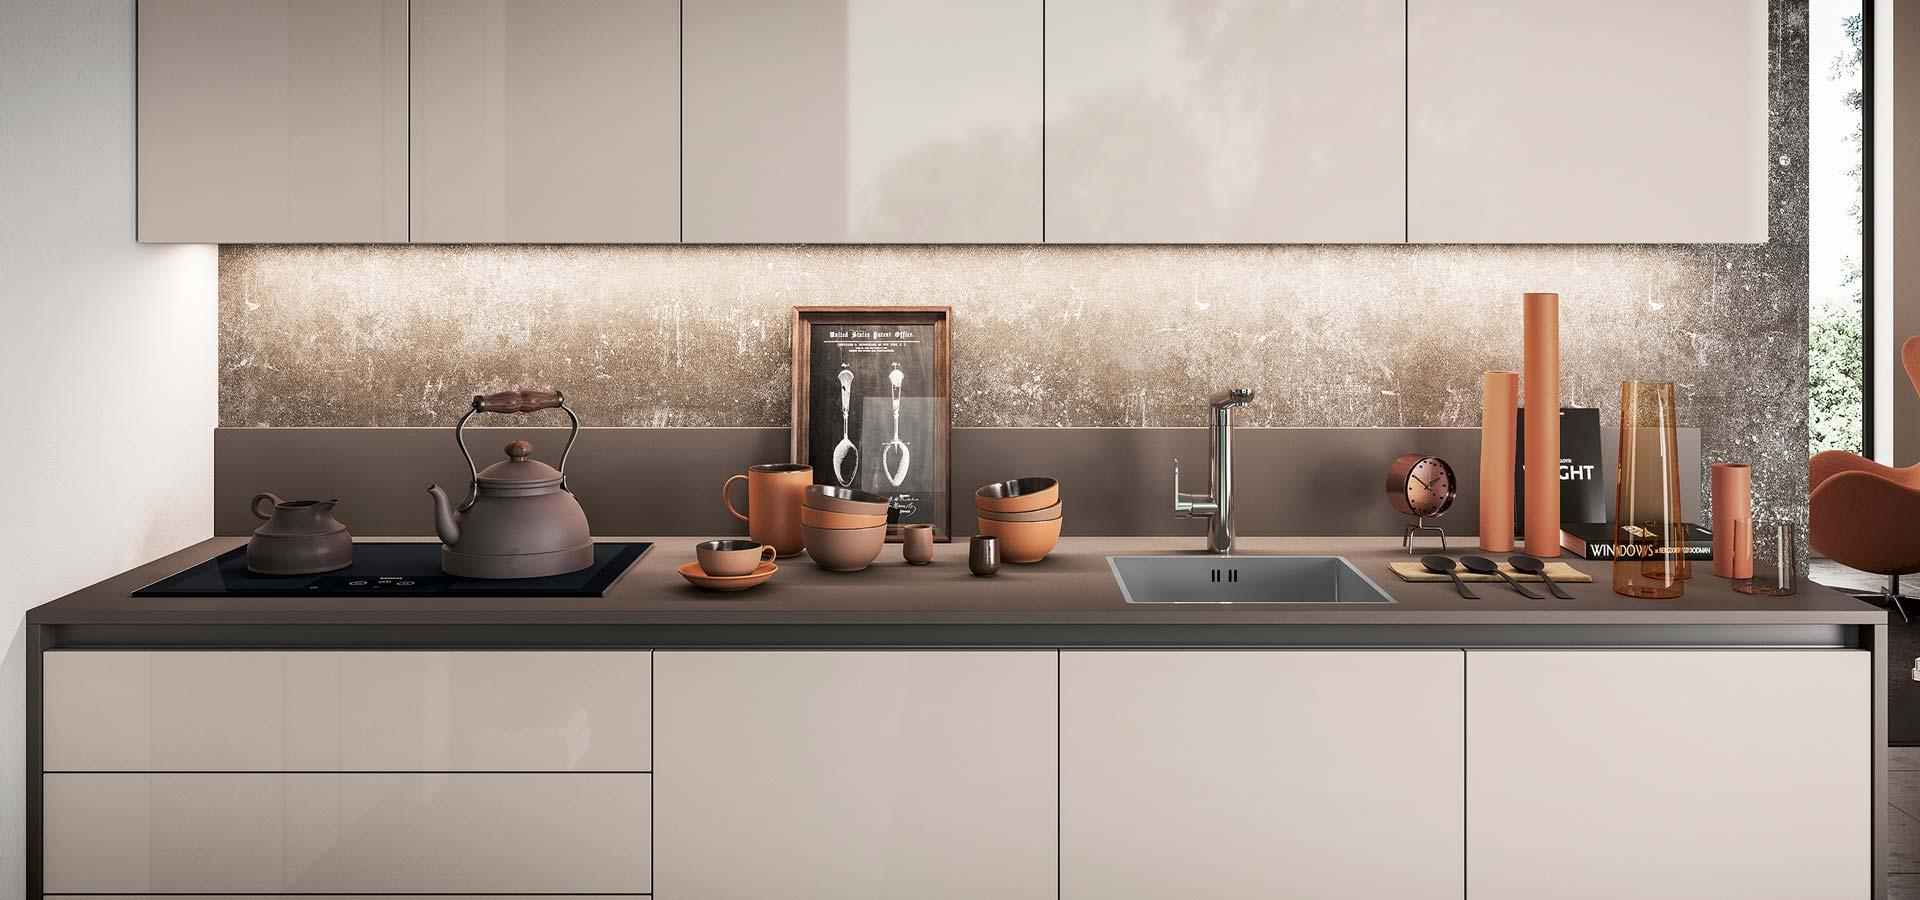 Emejing Elmar Cucine Opinioni Images - Ideas & Design 2017 ...